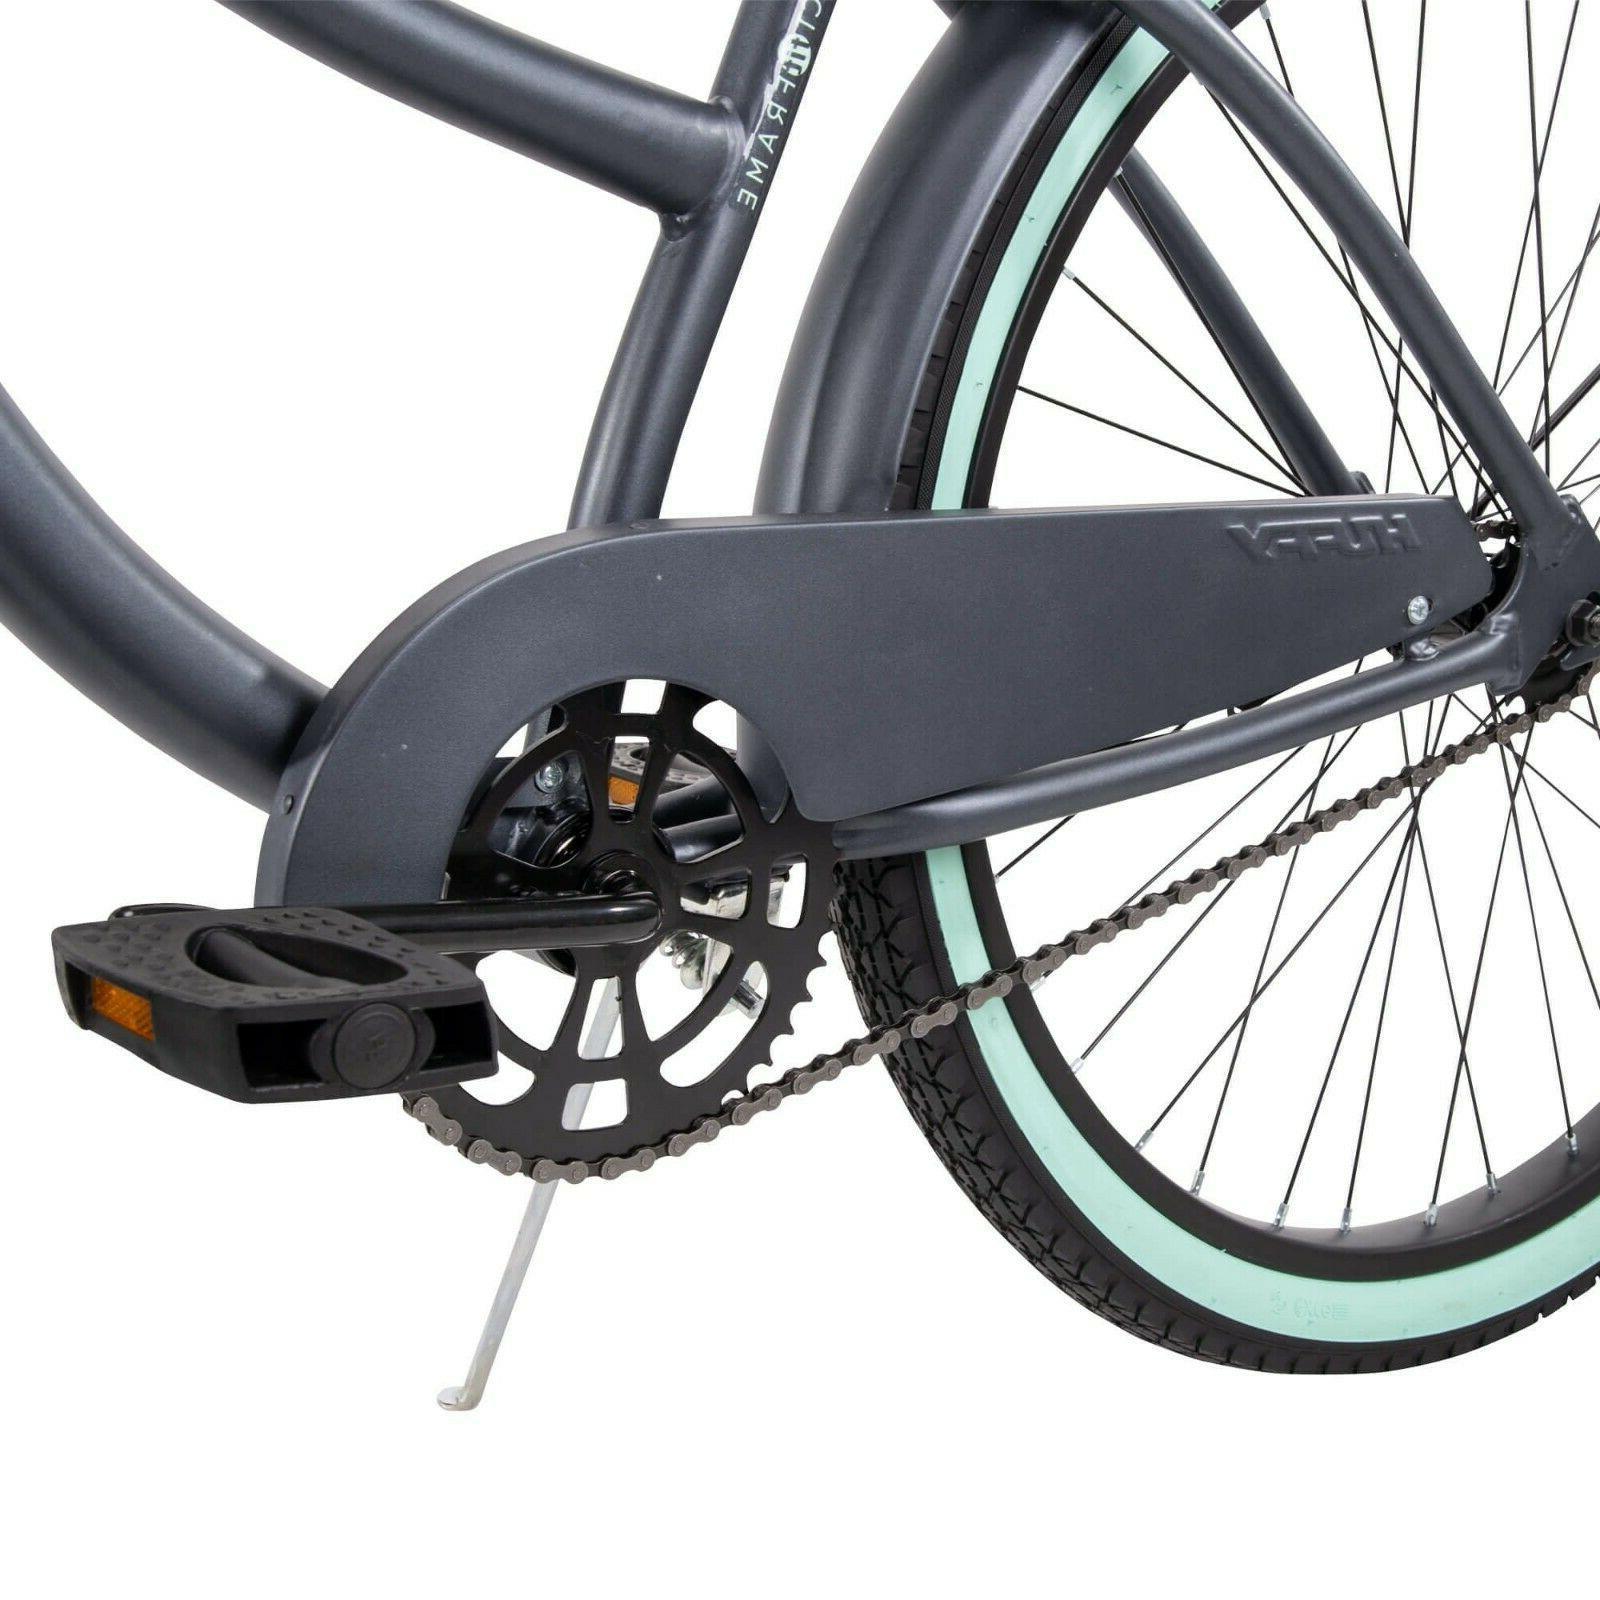 Huffy Women's Cruiser Bike - wheels